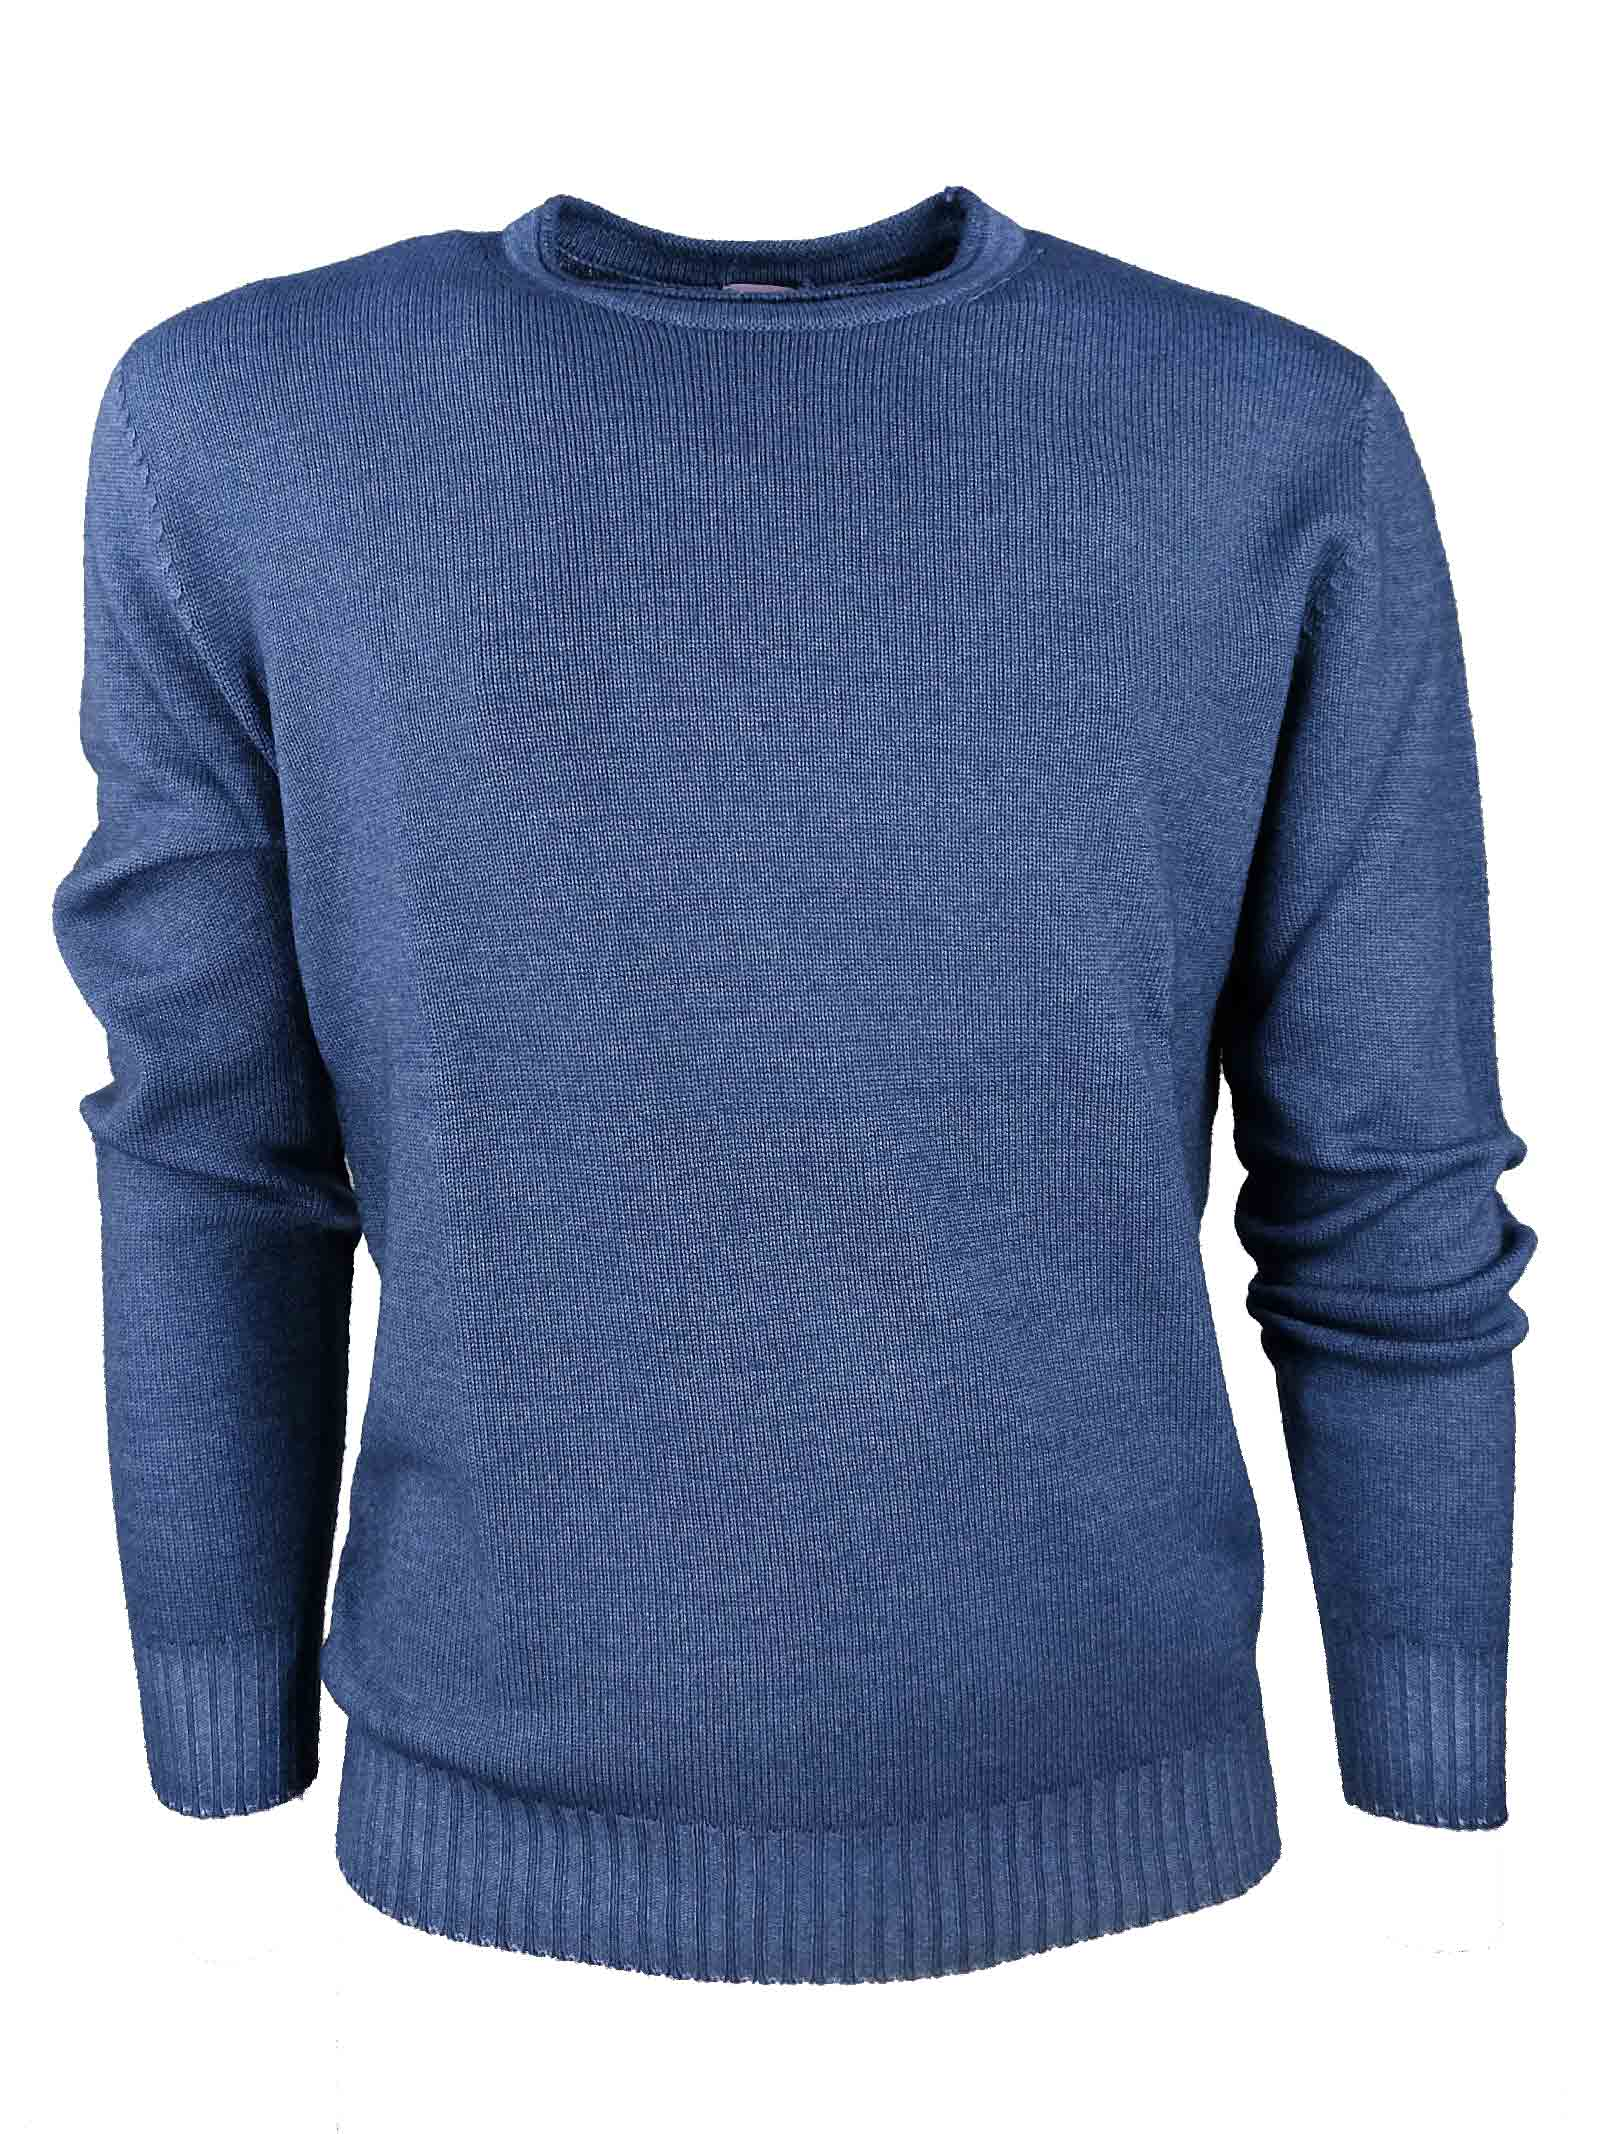 MERINO SWEATERFROSTED STYLE H953 | Knitwear | 294789